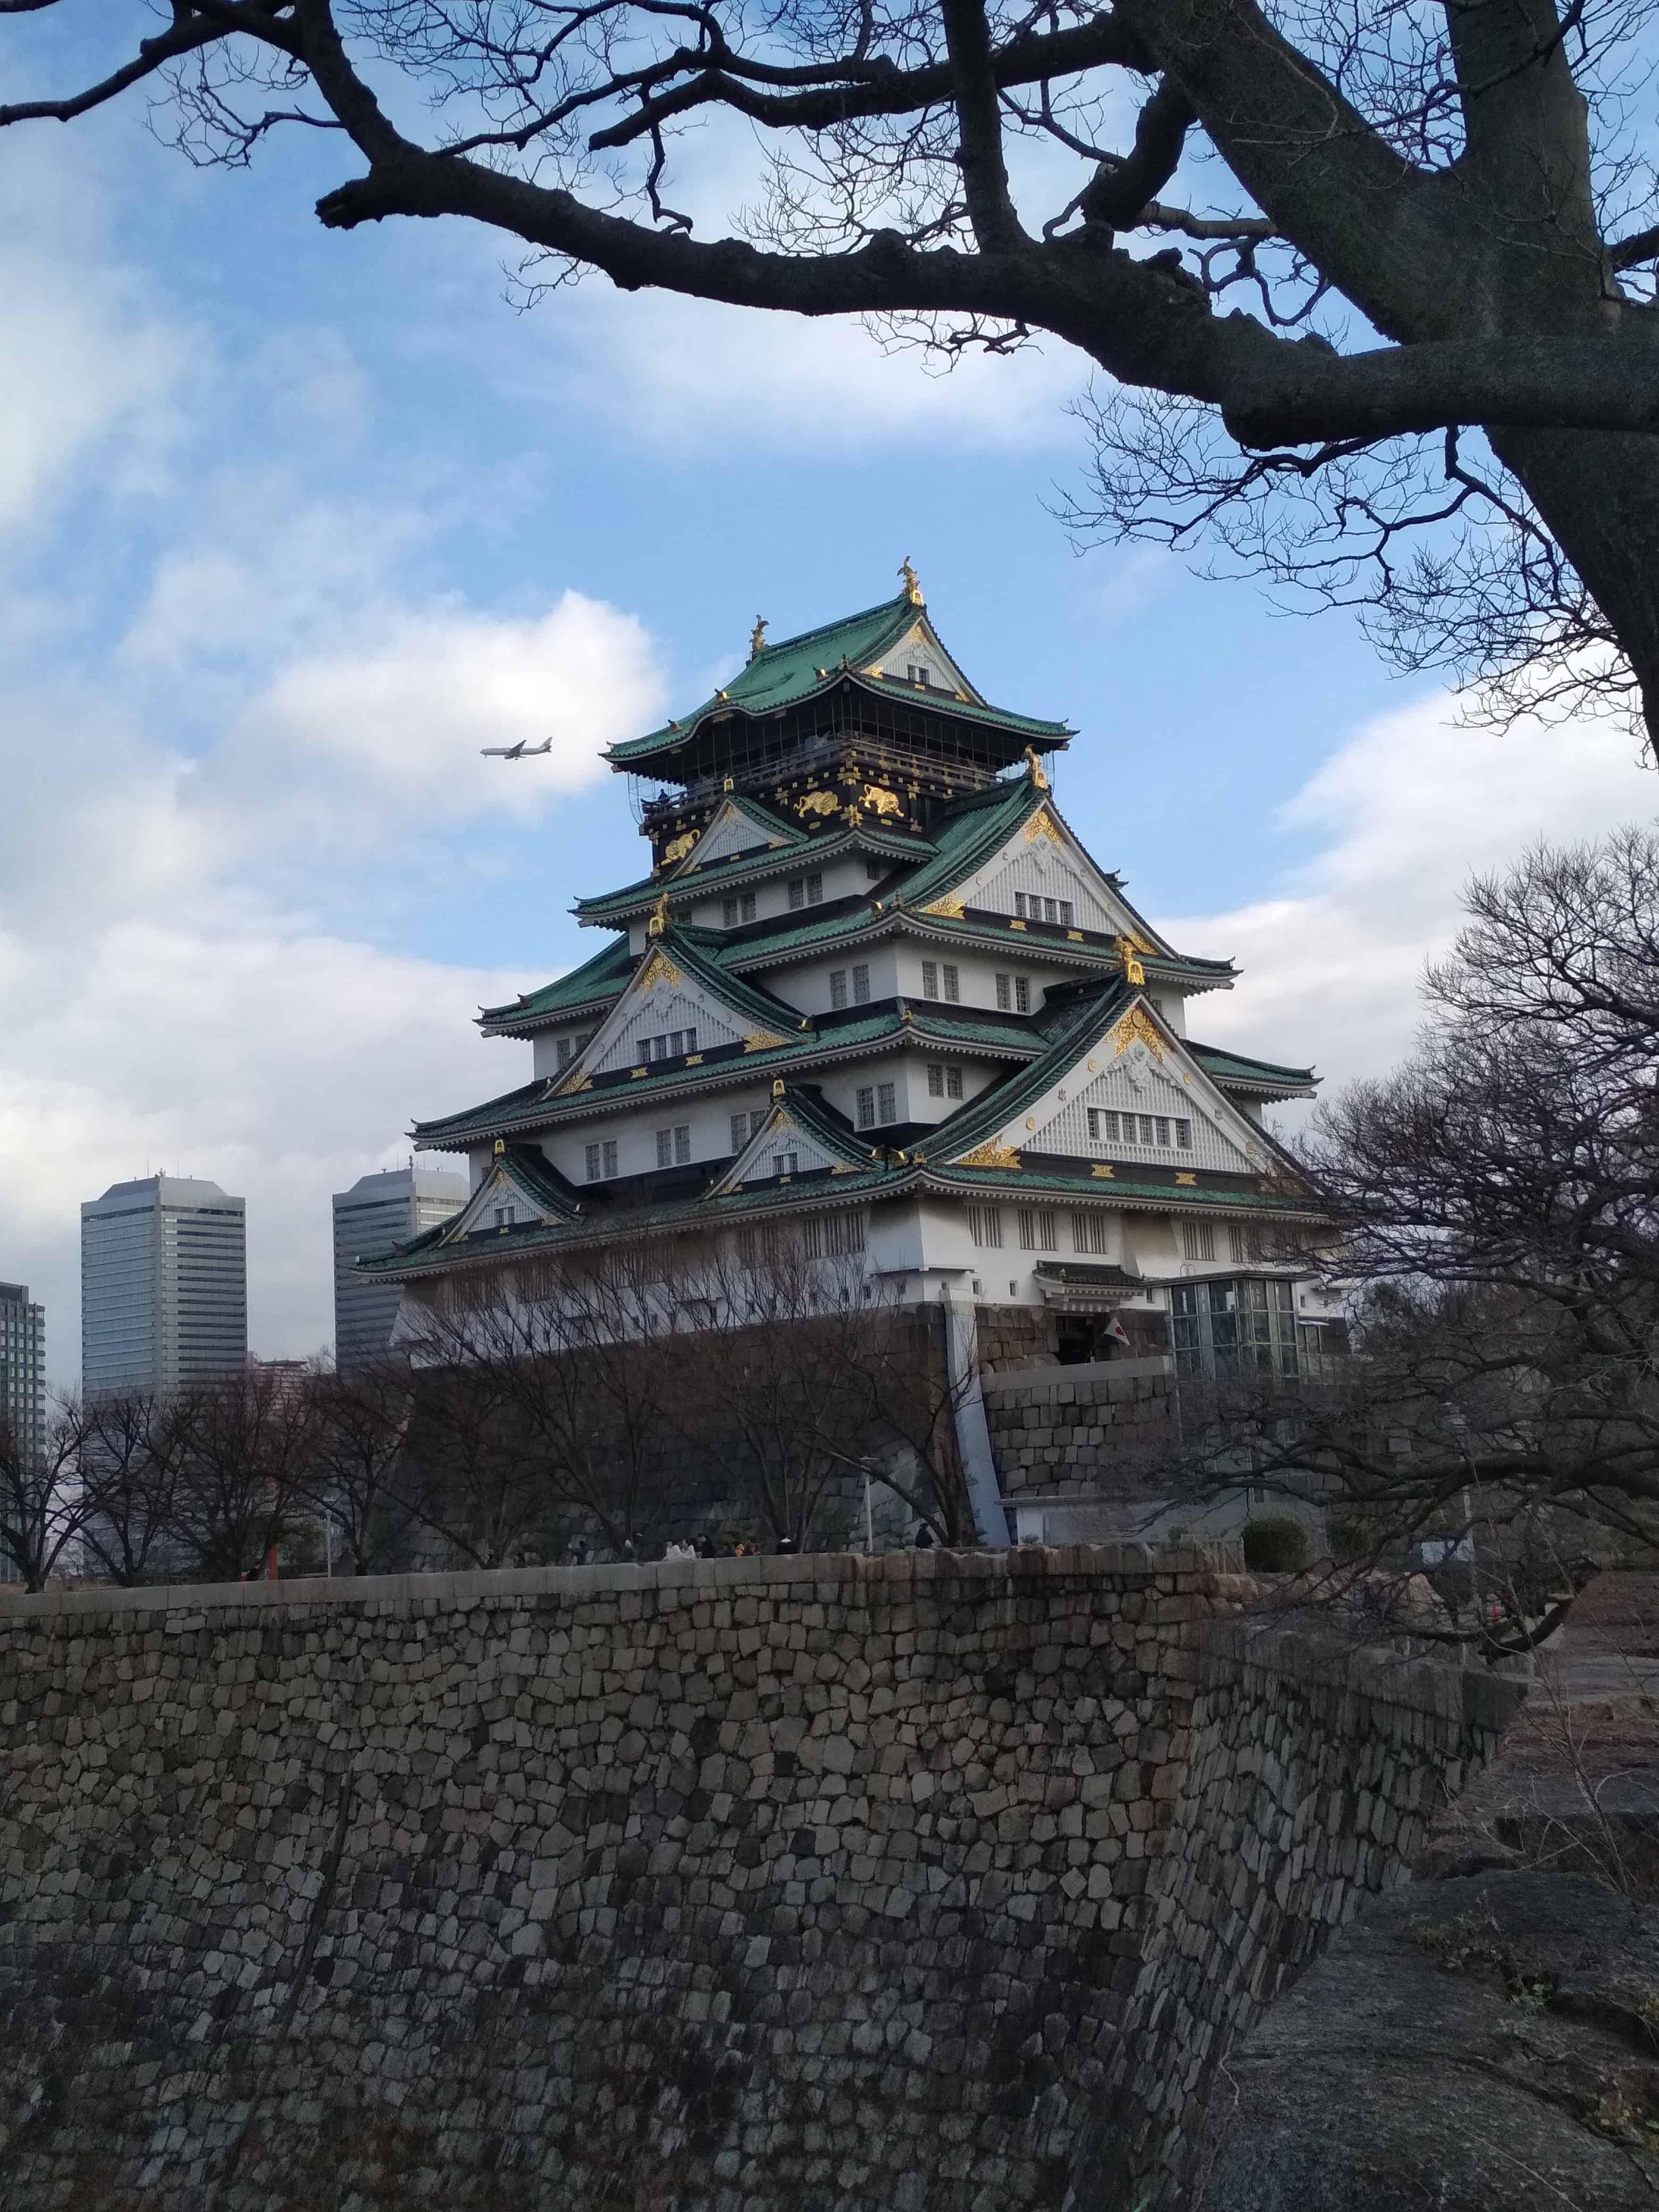 Osaka Castillo de Osaka - Lugares de interés en Osaka: todo lo que tienes que saber